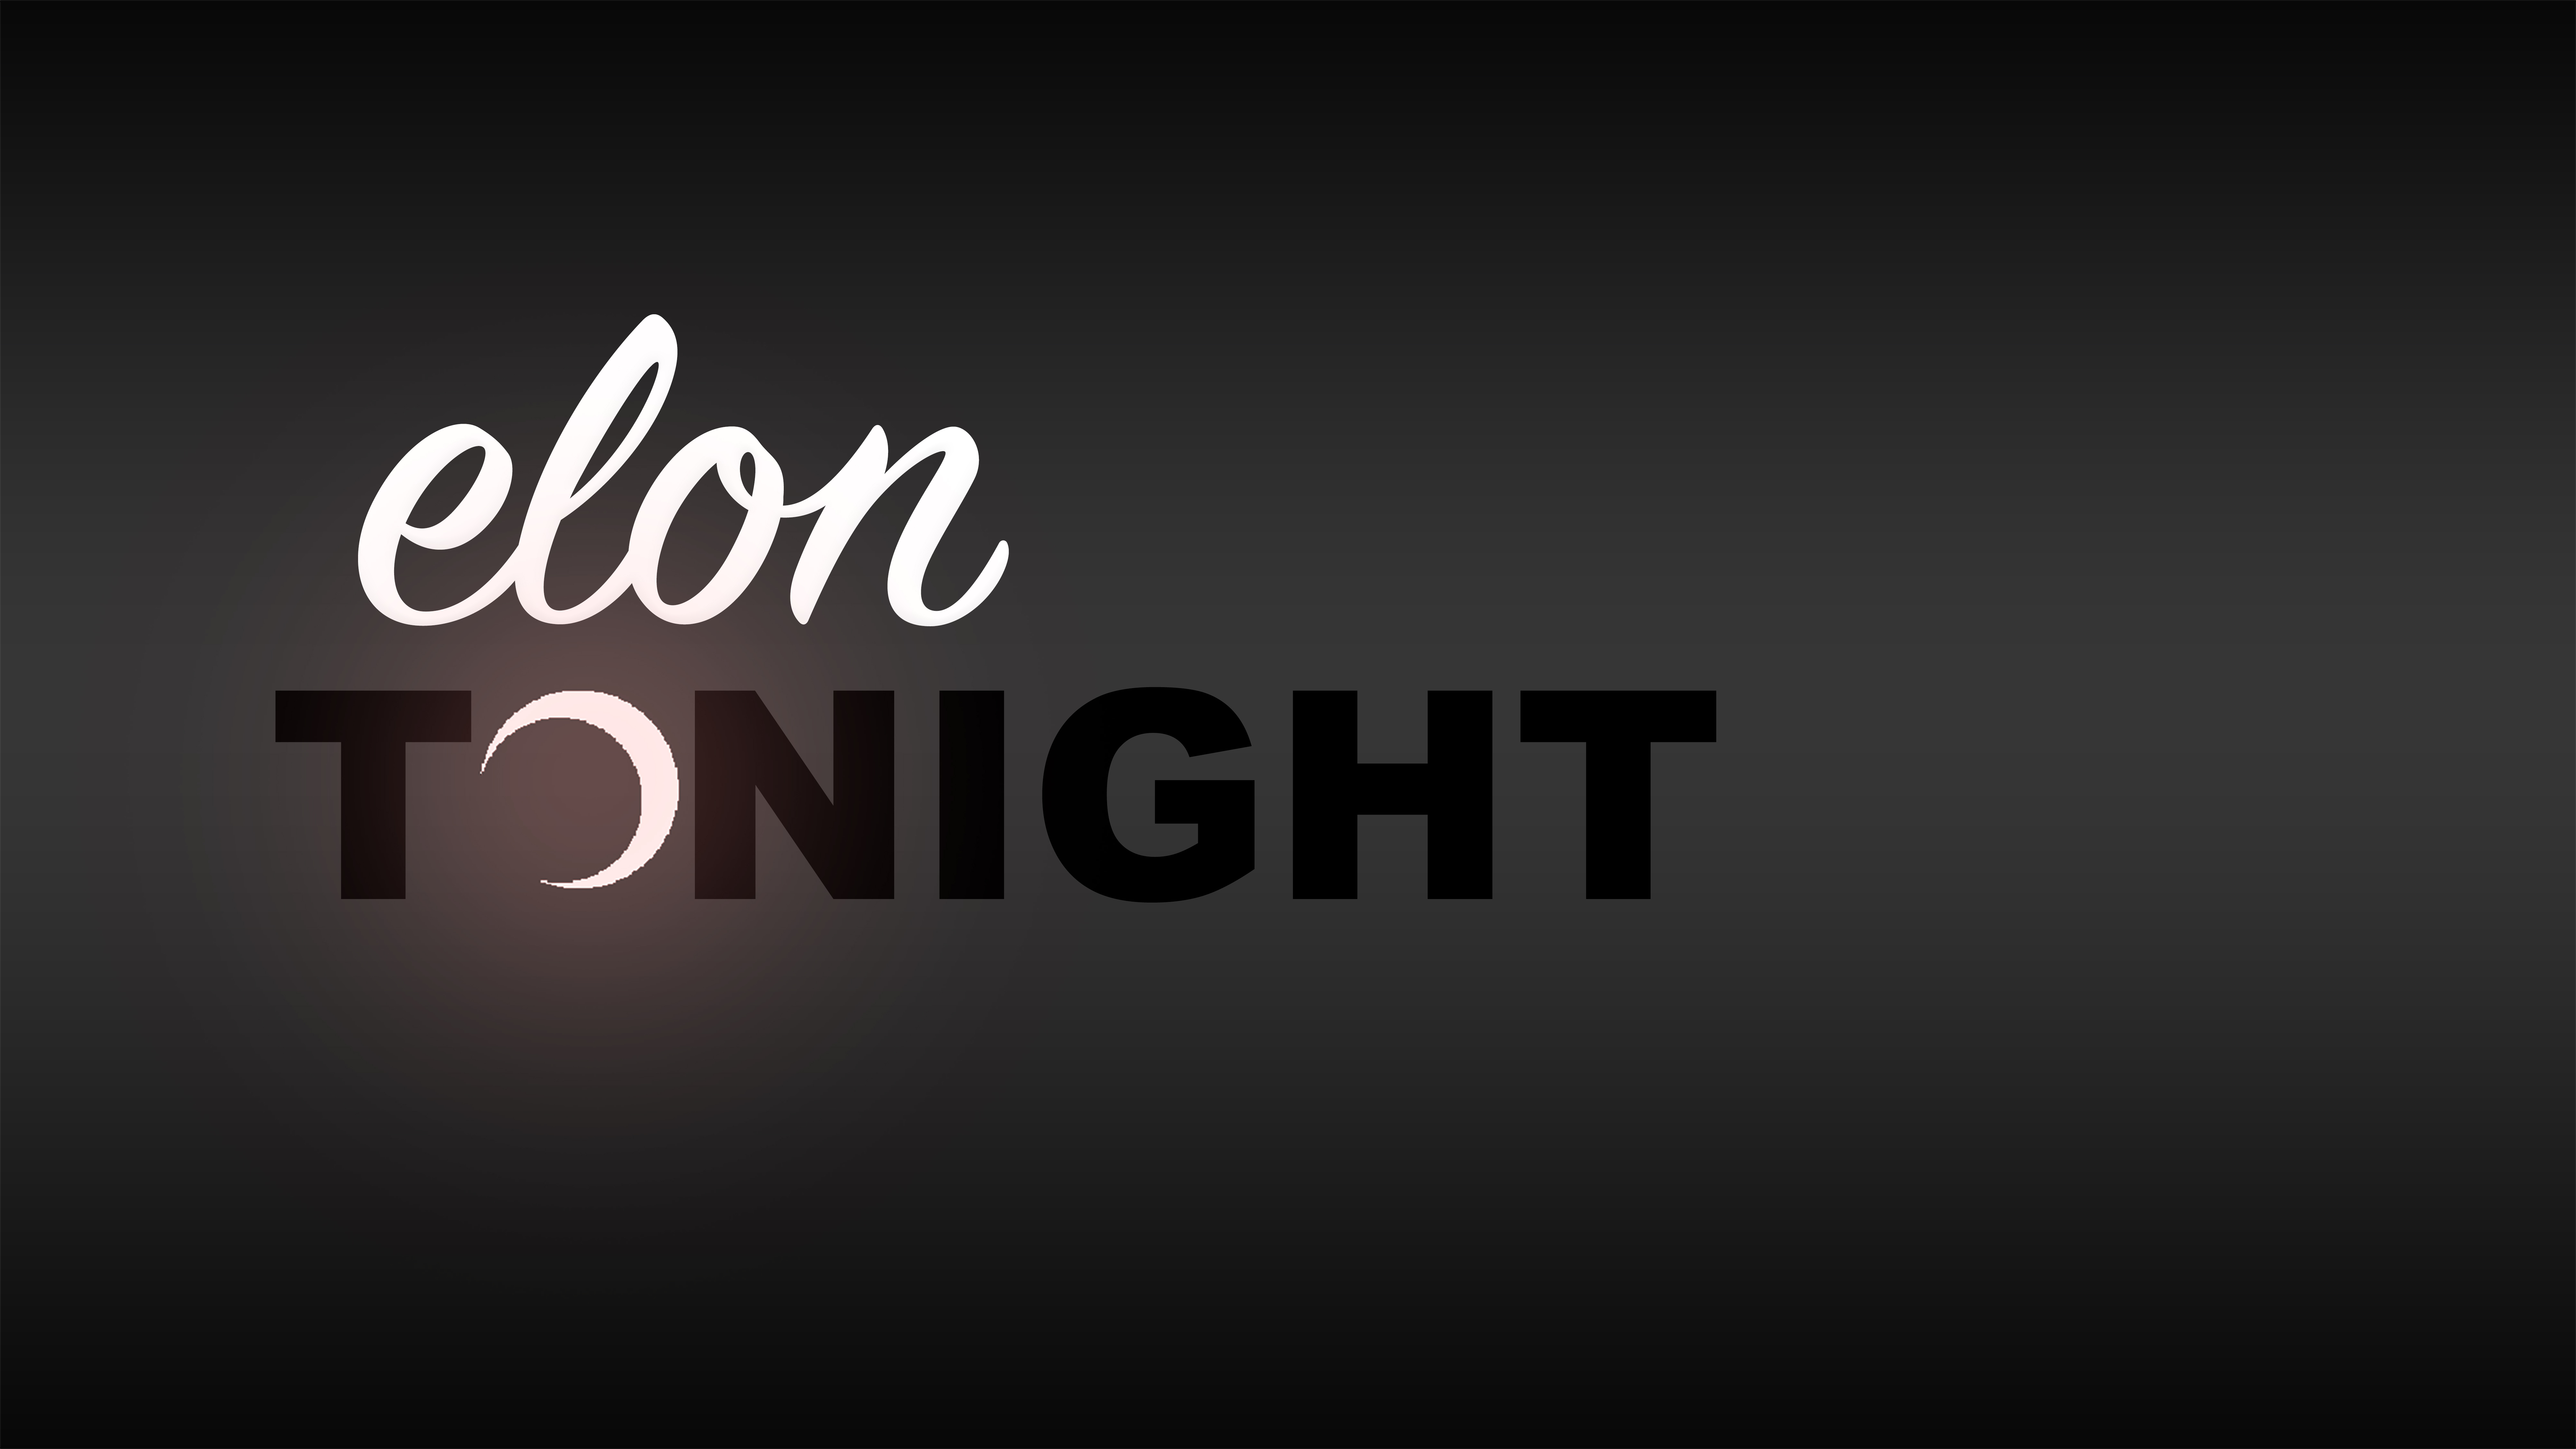 Elon Tonight Final